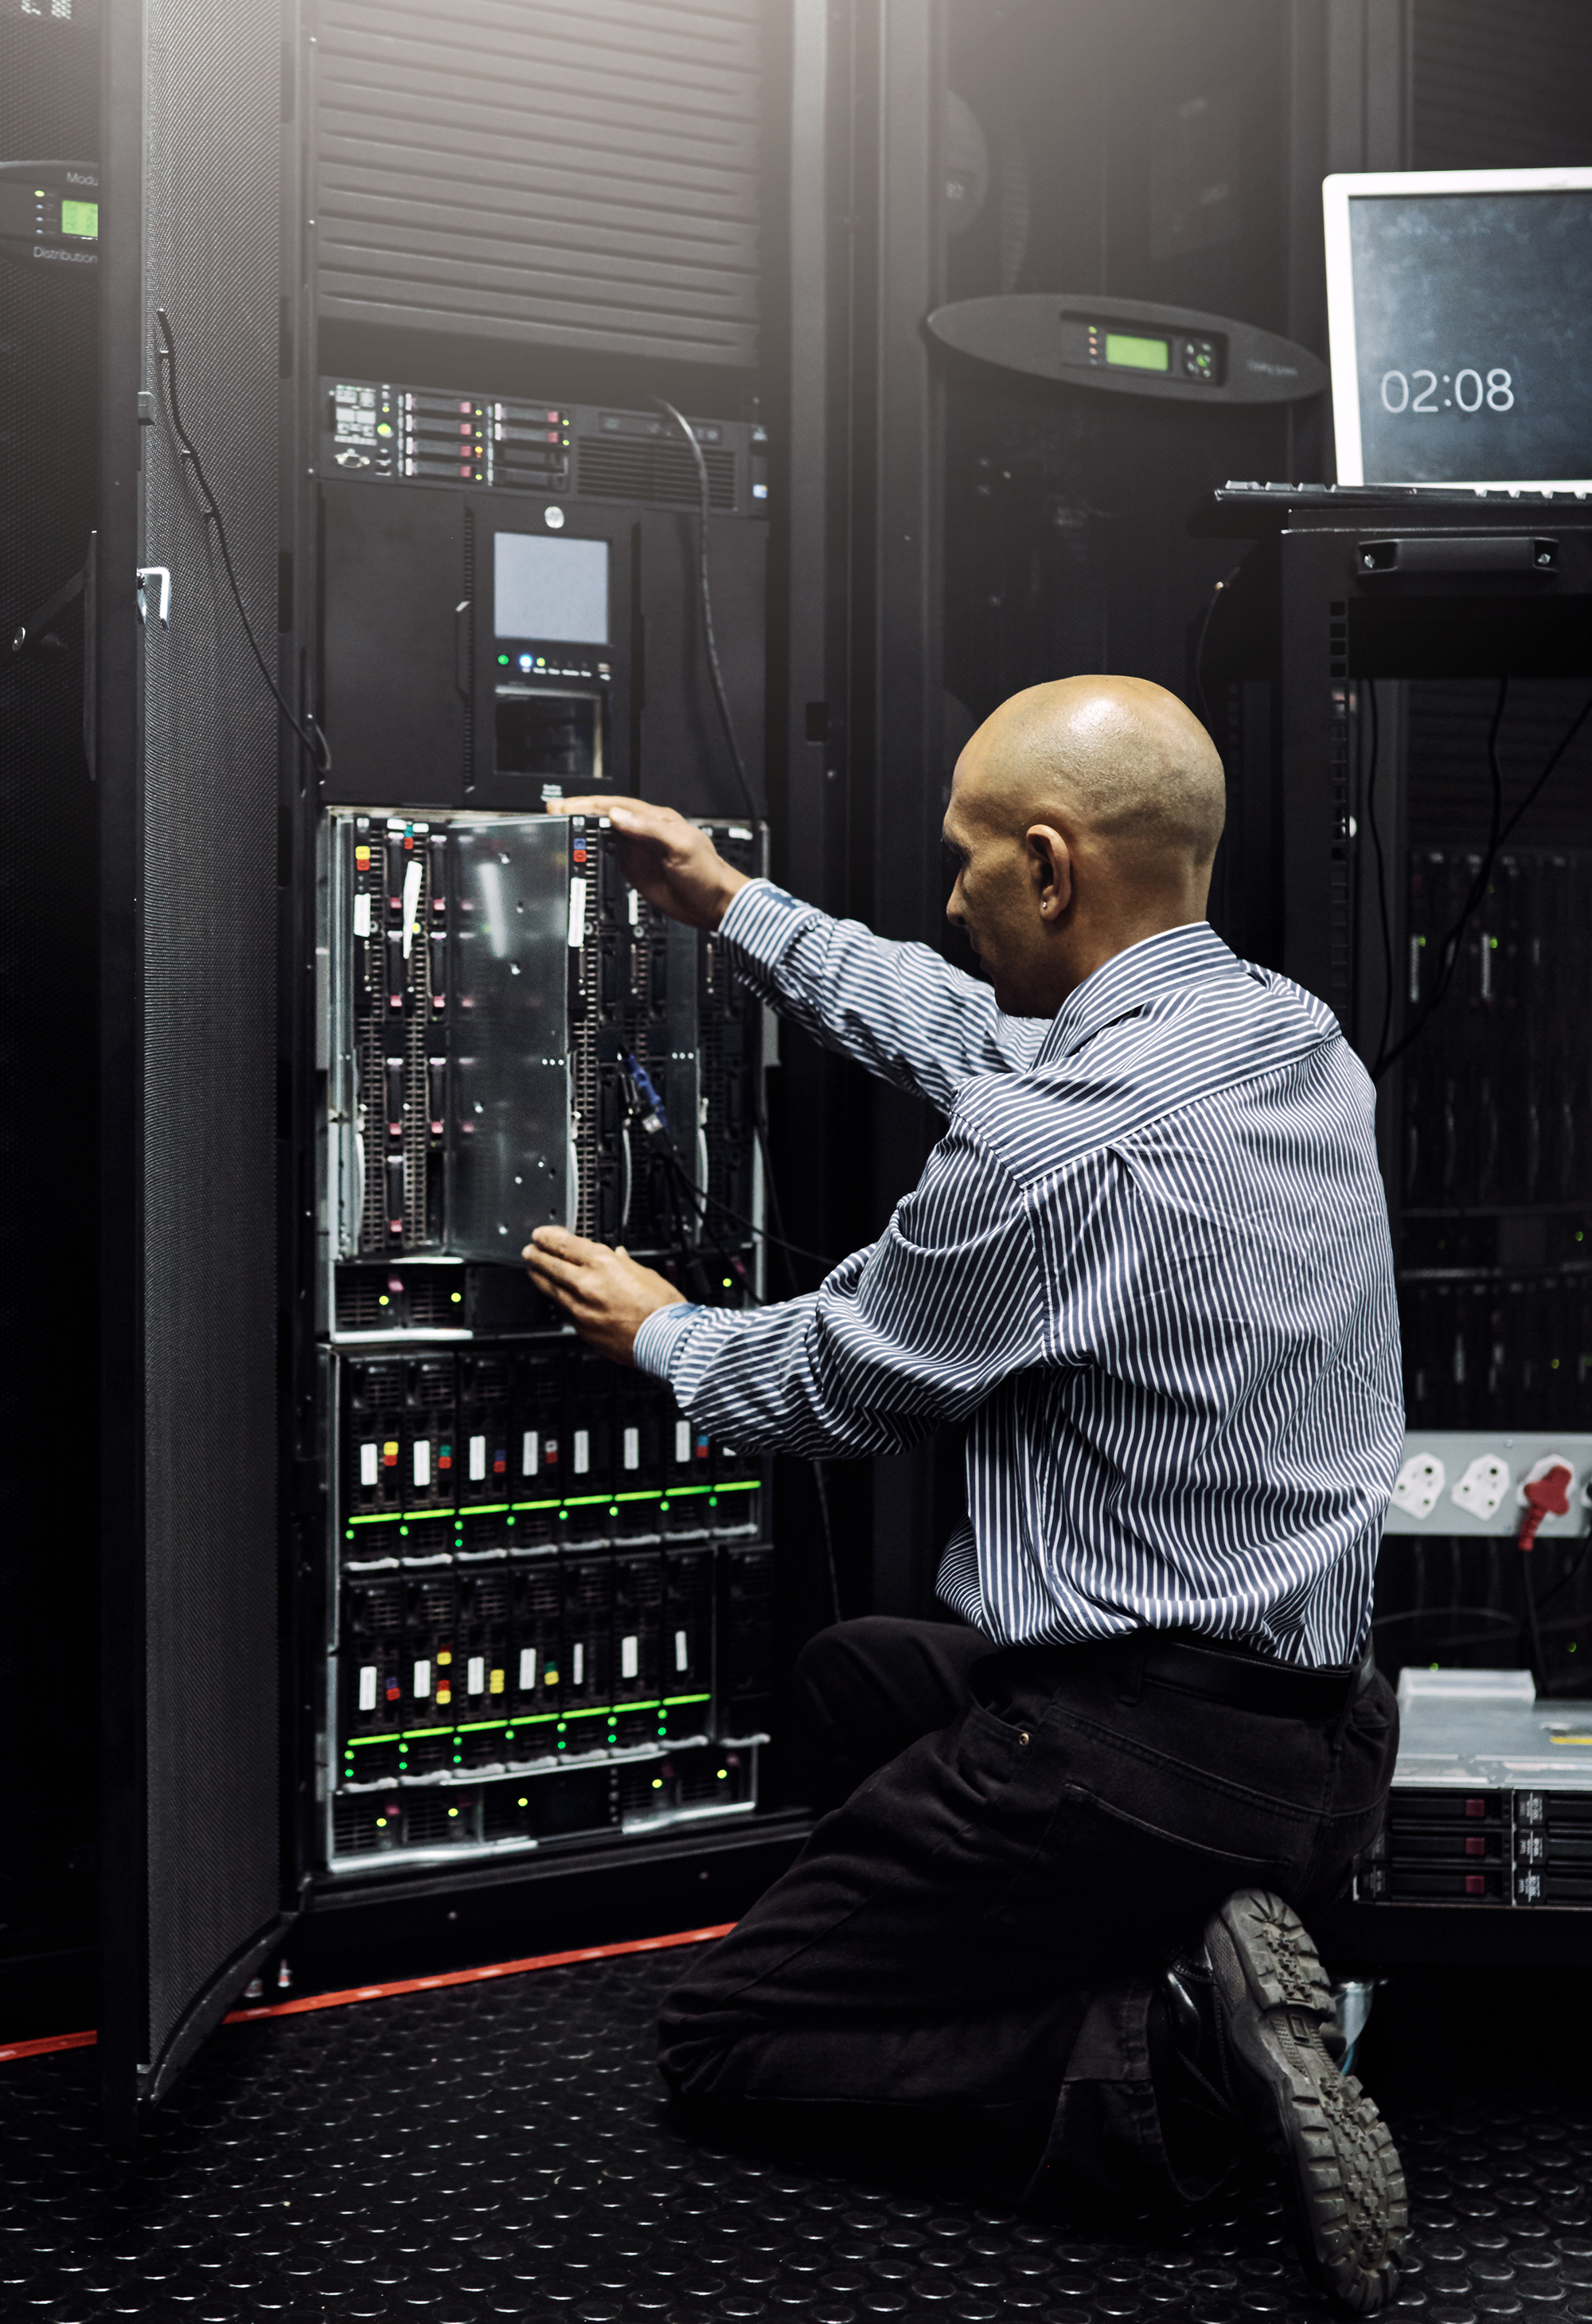 IT technician repairing a computer